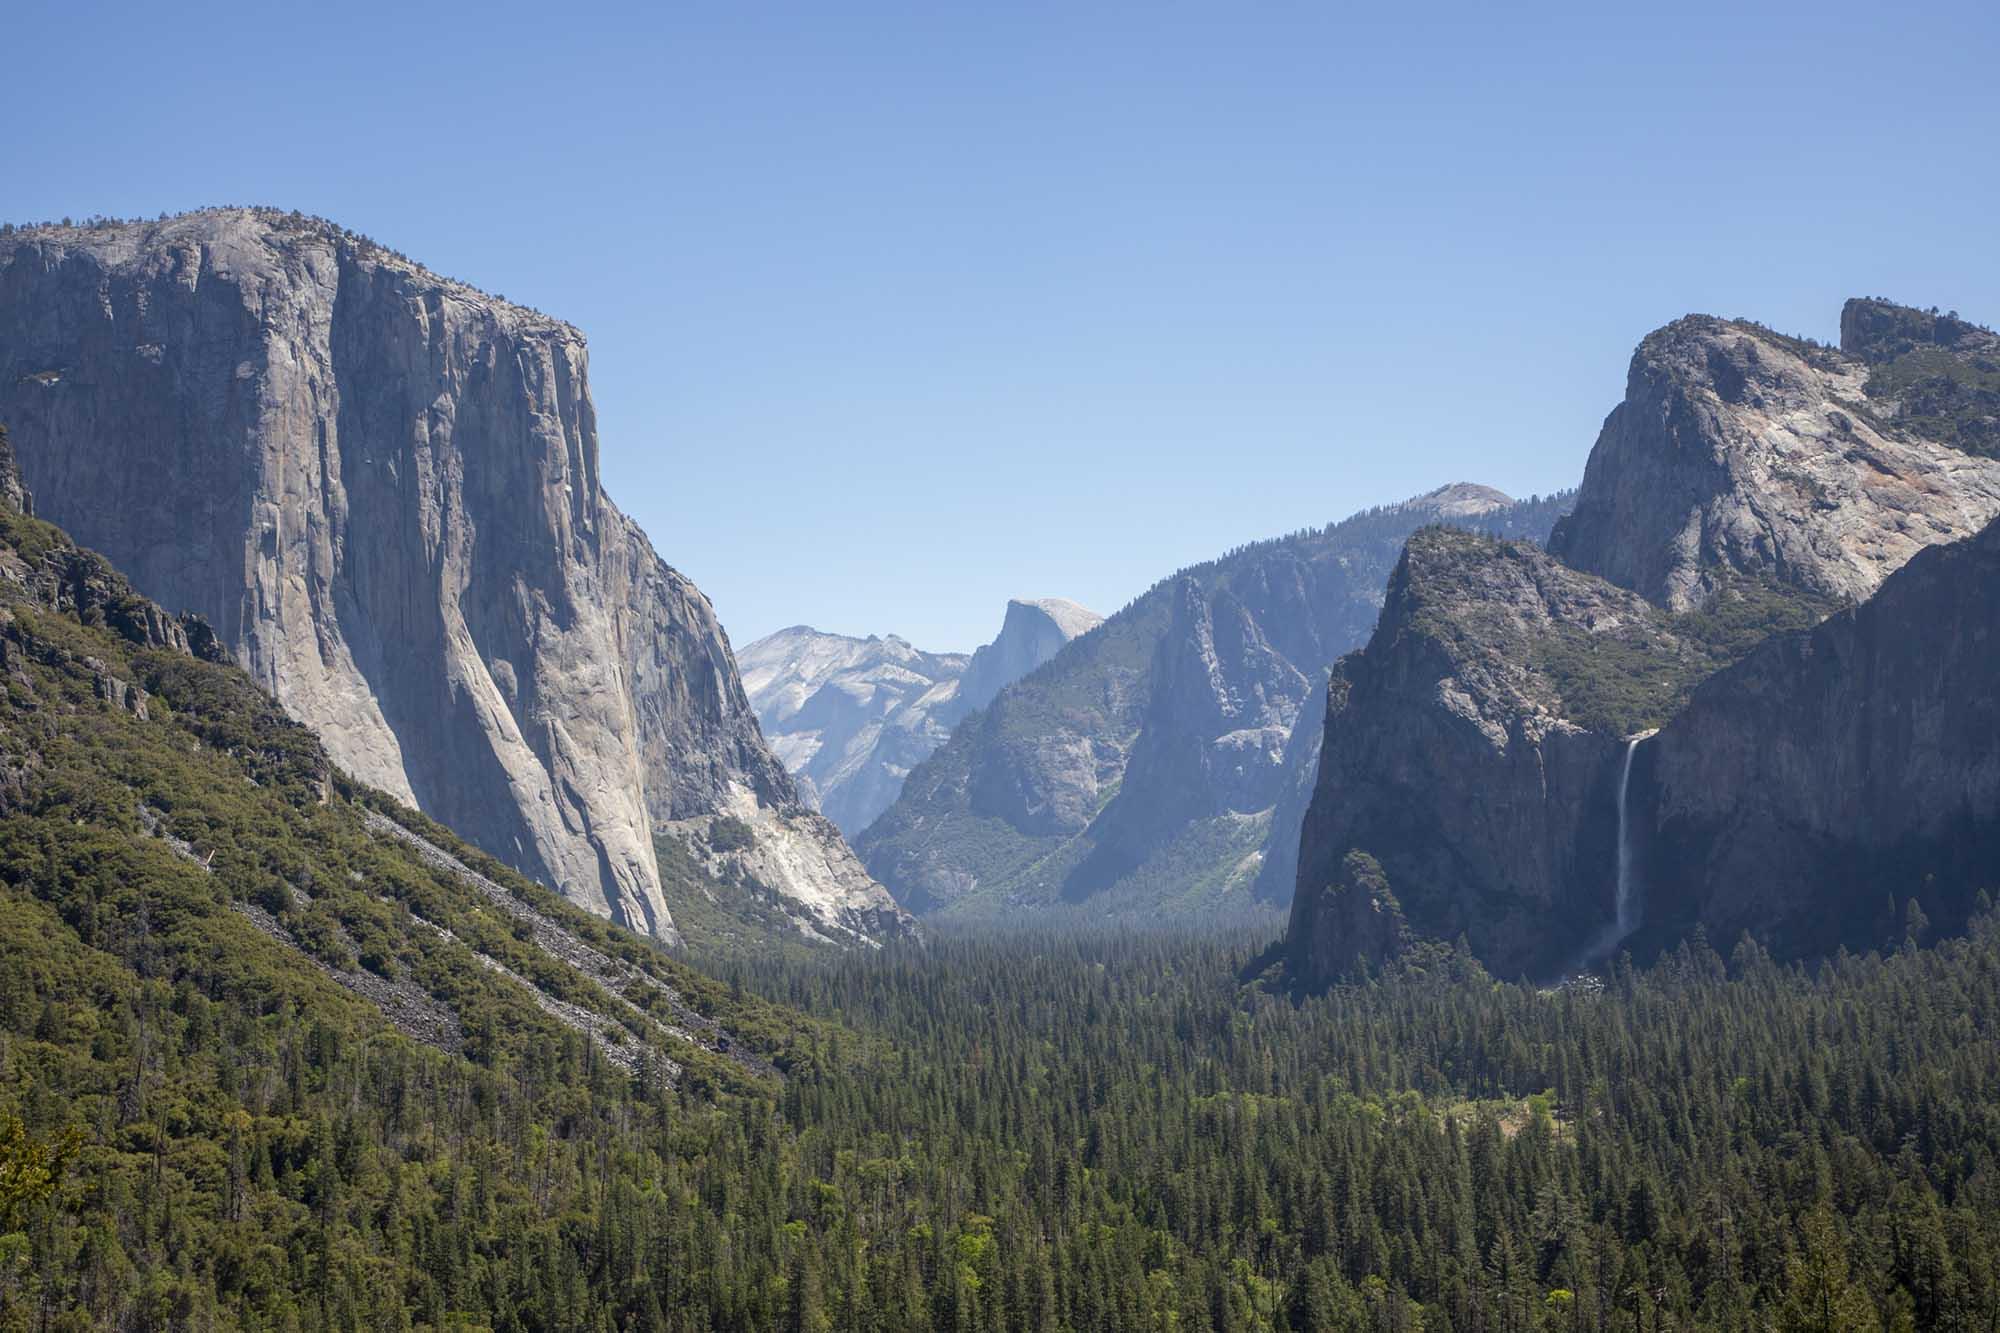 New Images: Yosemite